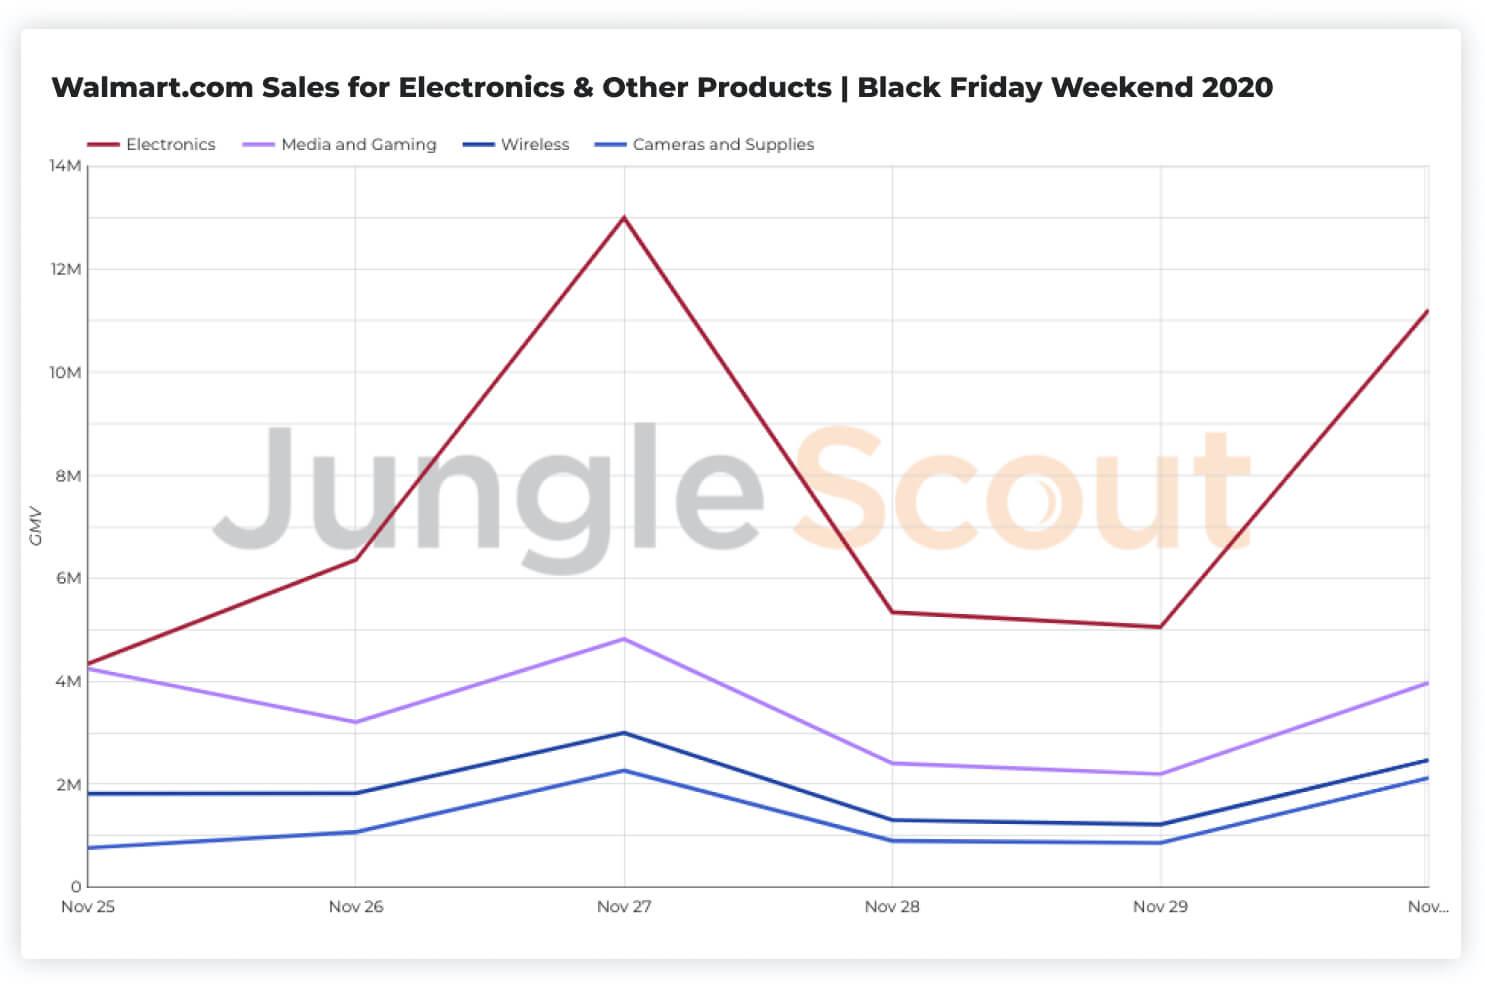 Walmart's electronics sales